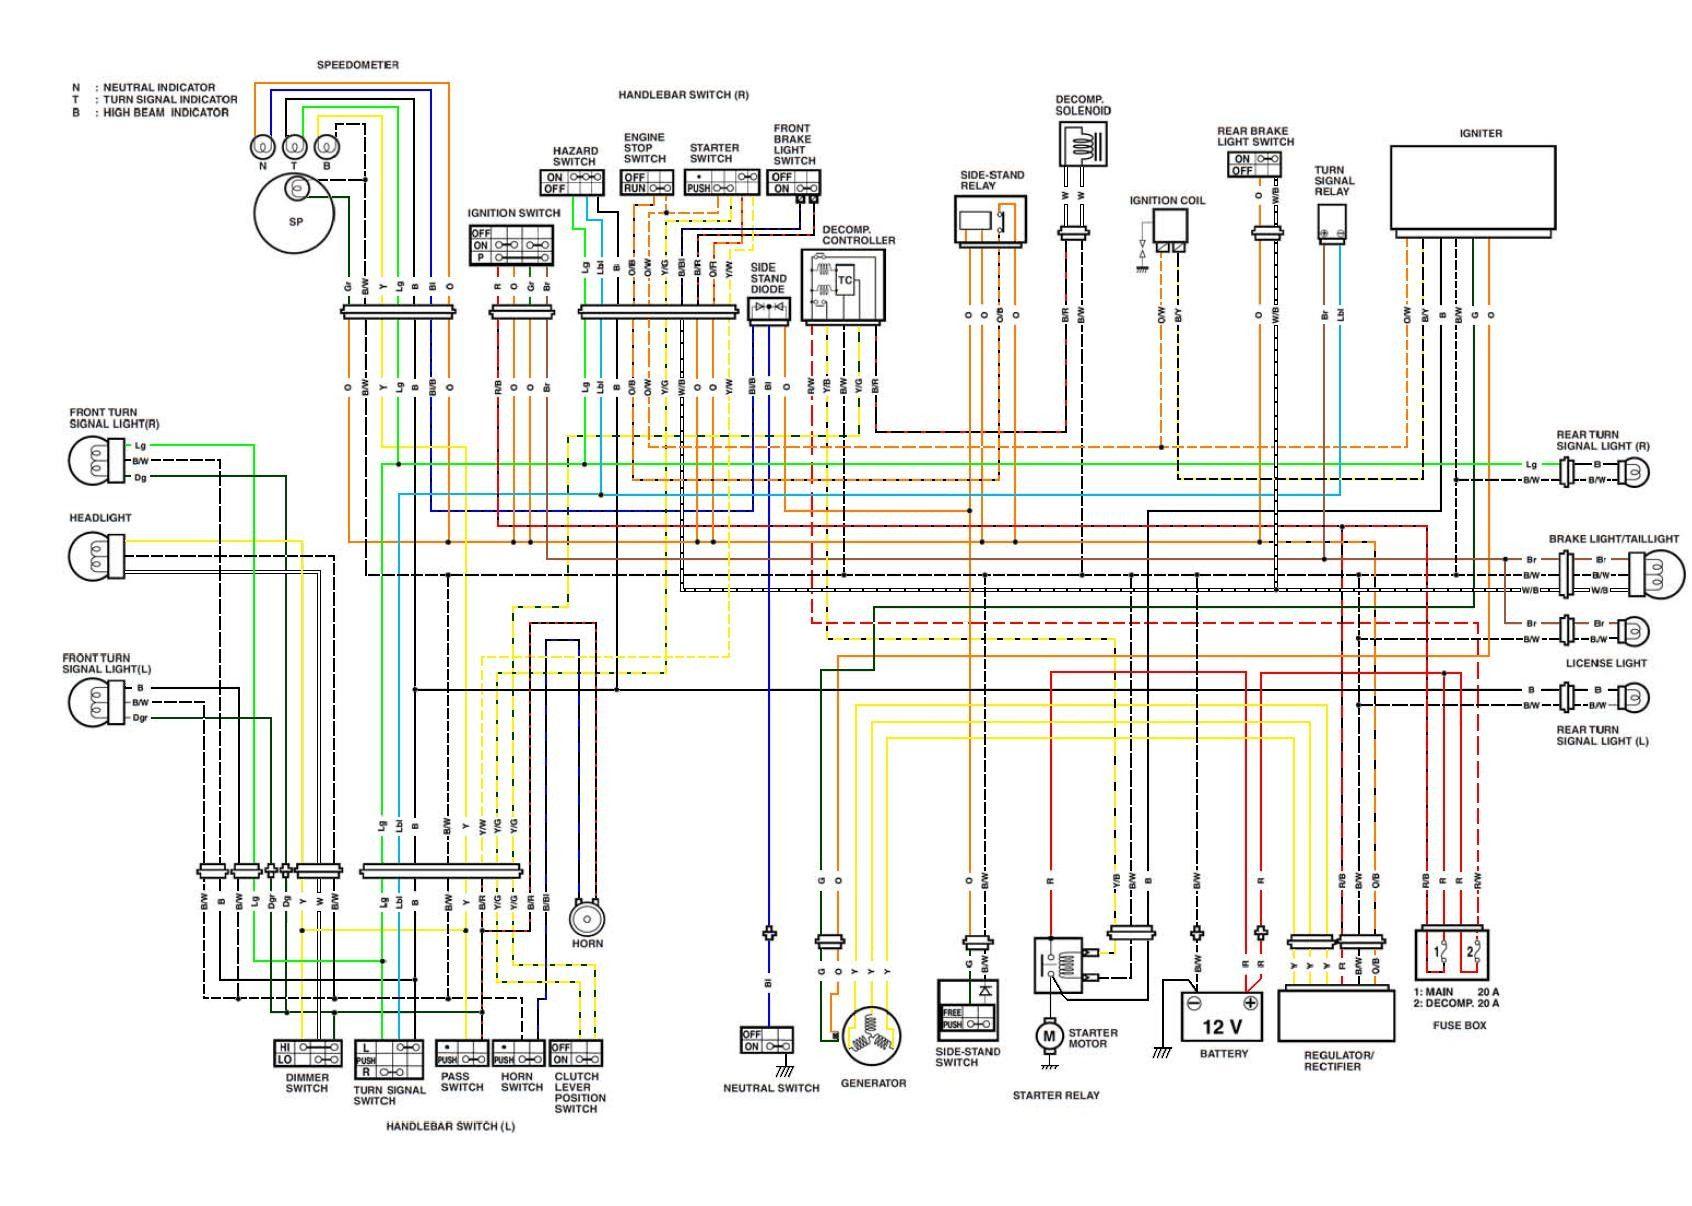 1974 Sportster Directional Light Wiring Diagram in 2020 ...